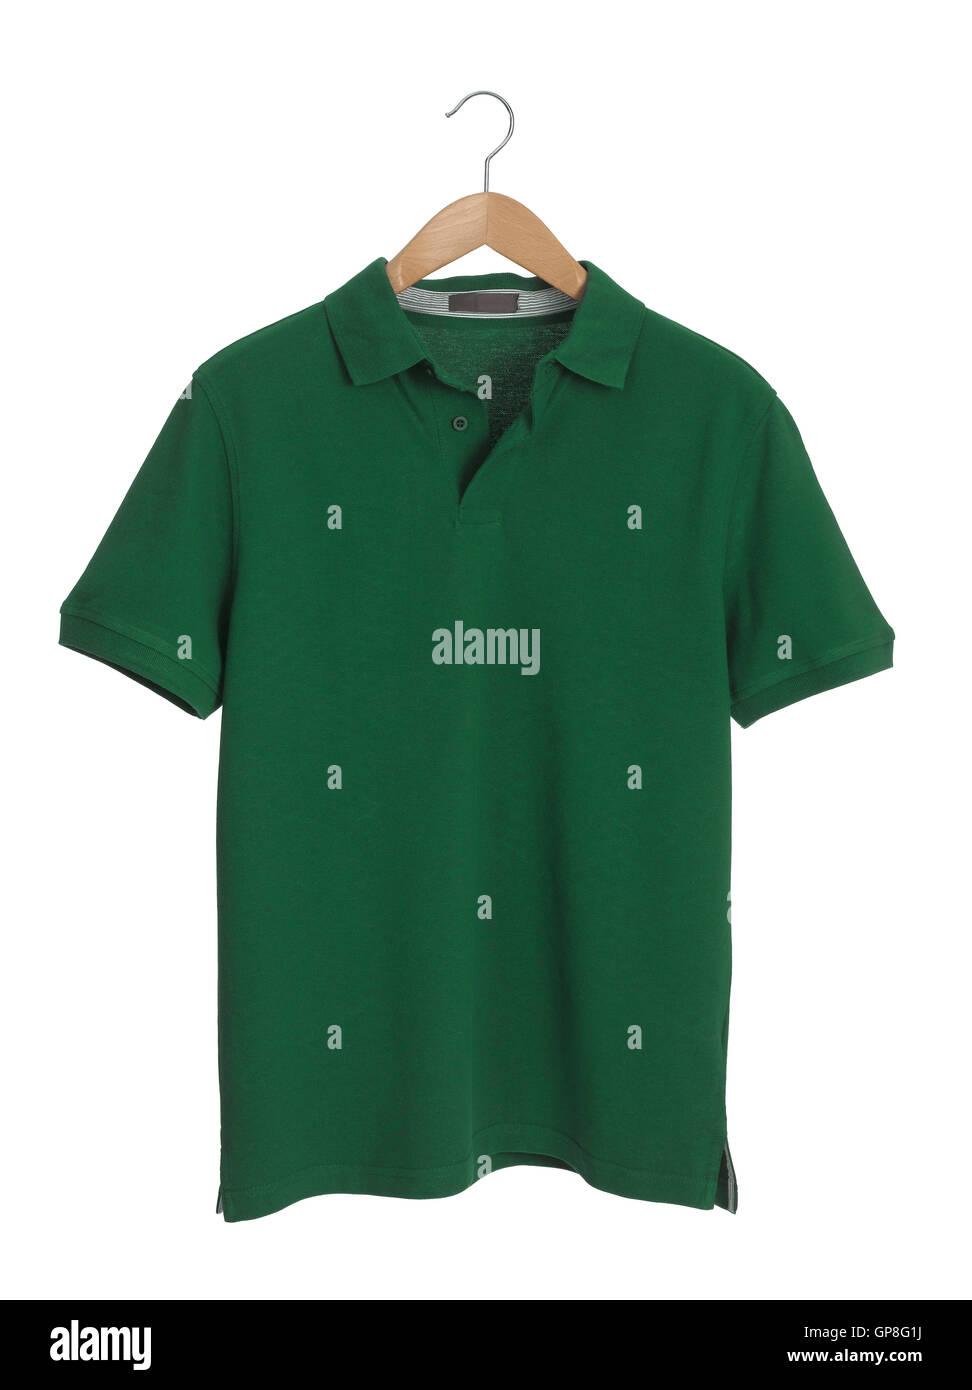 Camiseta verde en una percha de madera Foto de stock